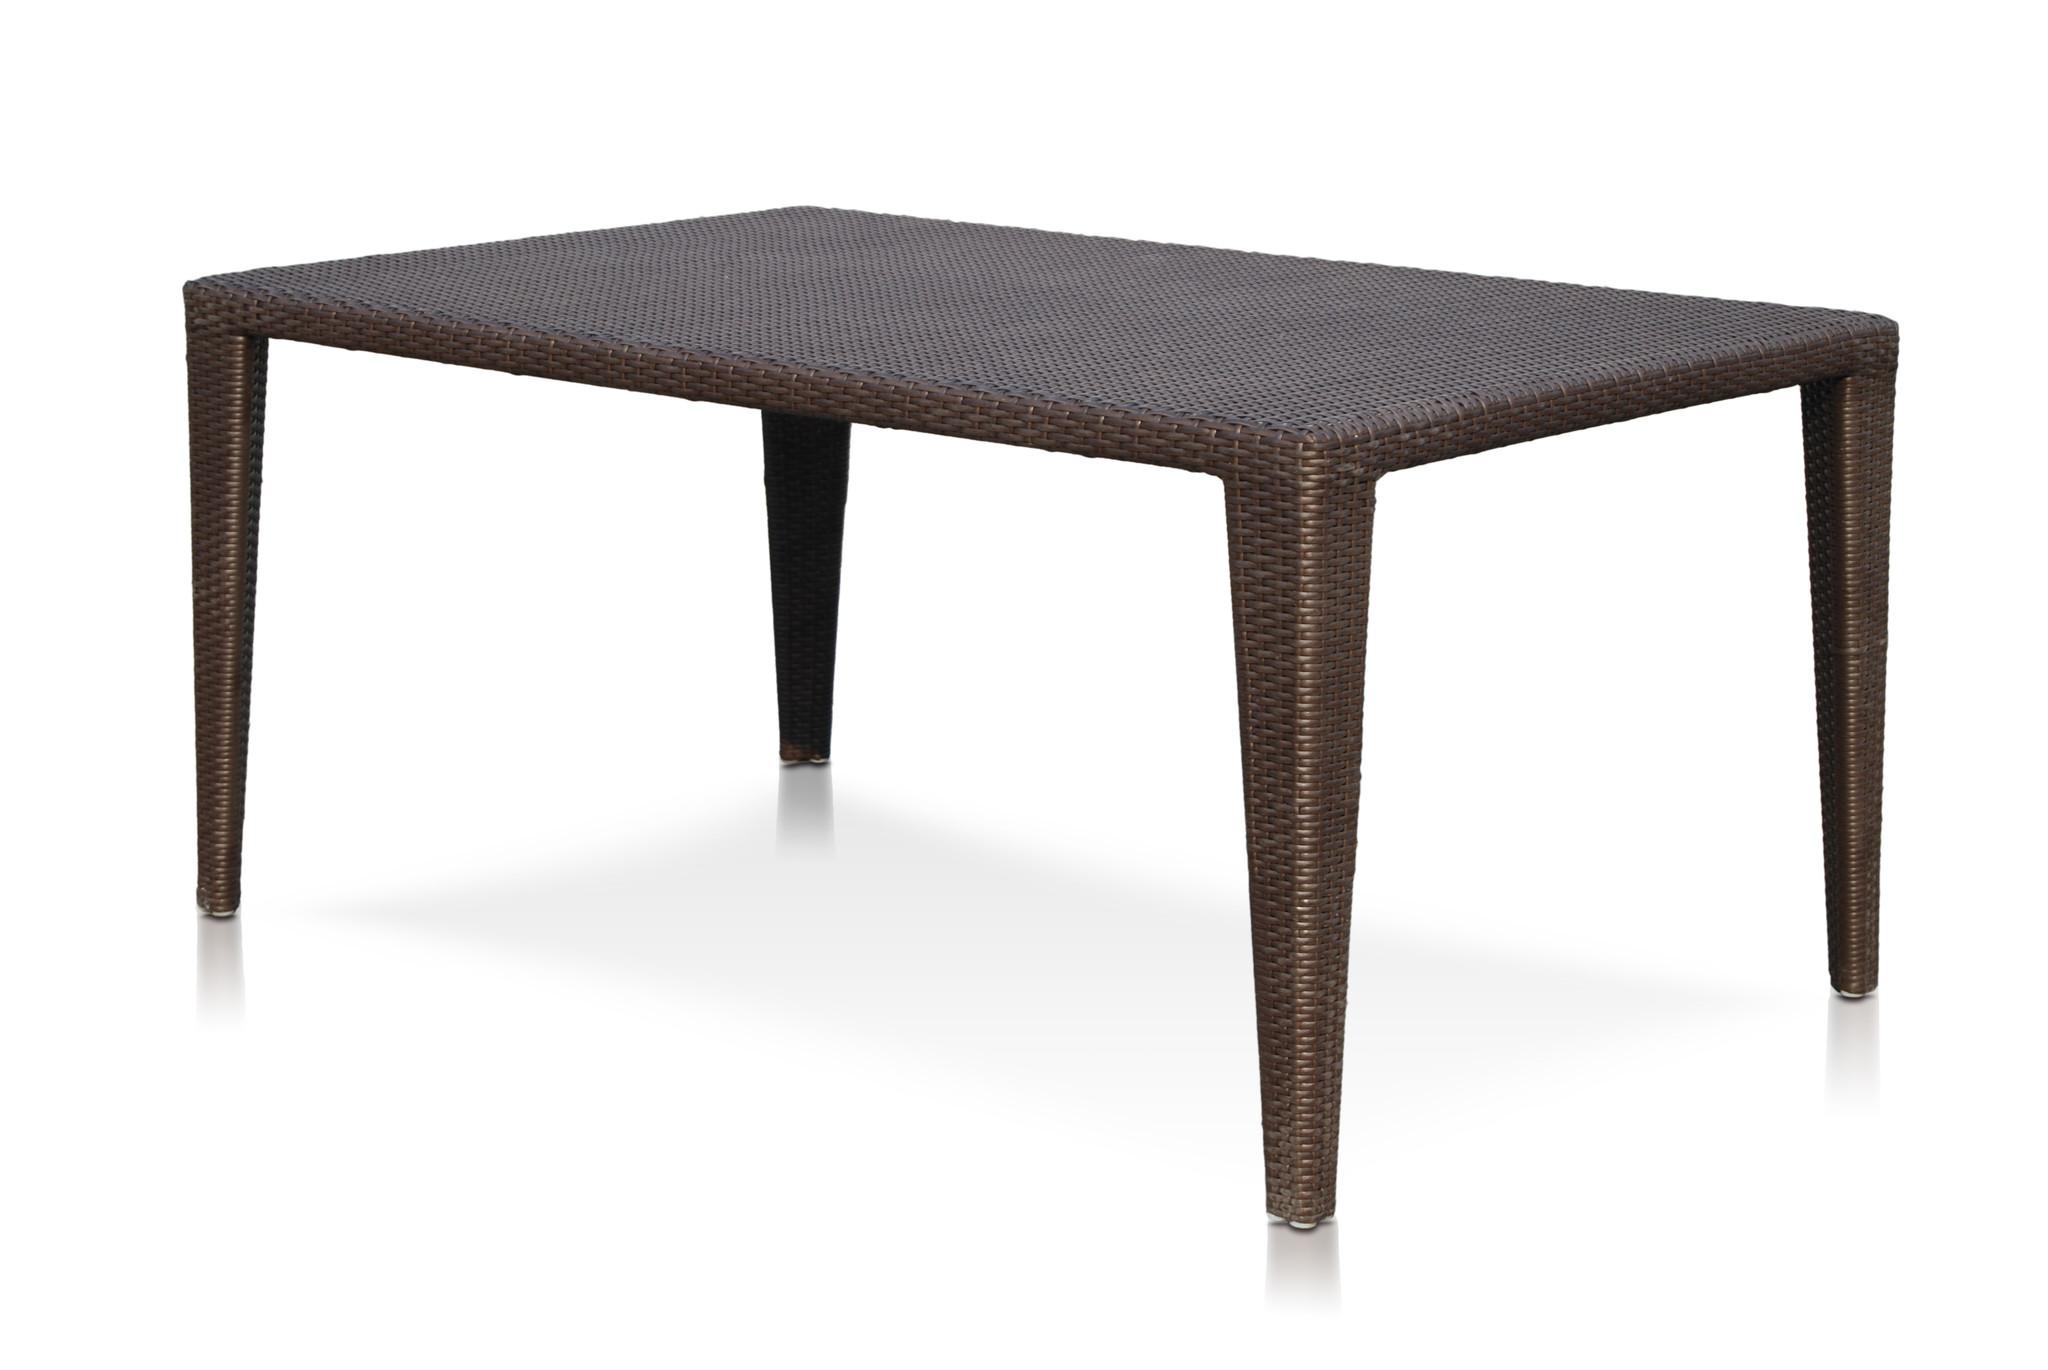 Стол обеденныйСтолы и столики для сада<br><br><br>Material: Ротанг<br>Width см: 200<br>Depth см: 100<br>Height см: 74